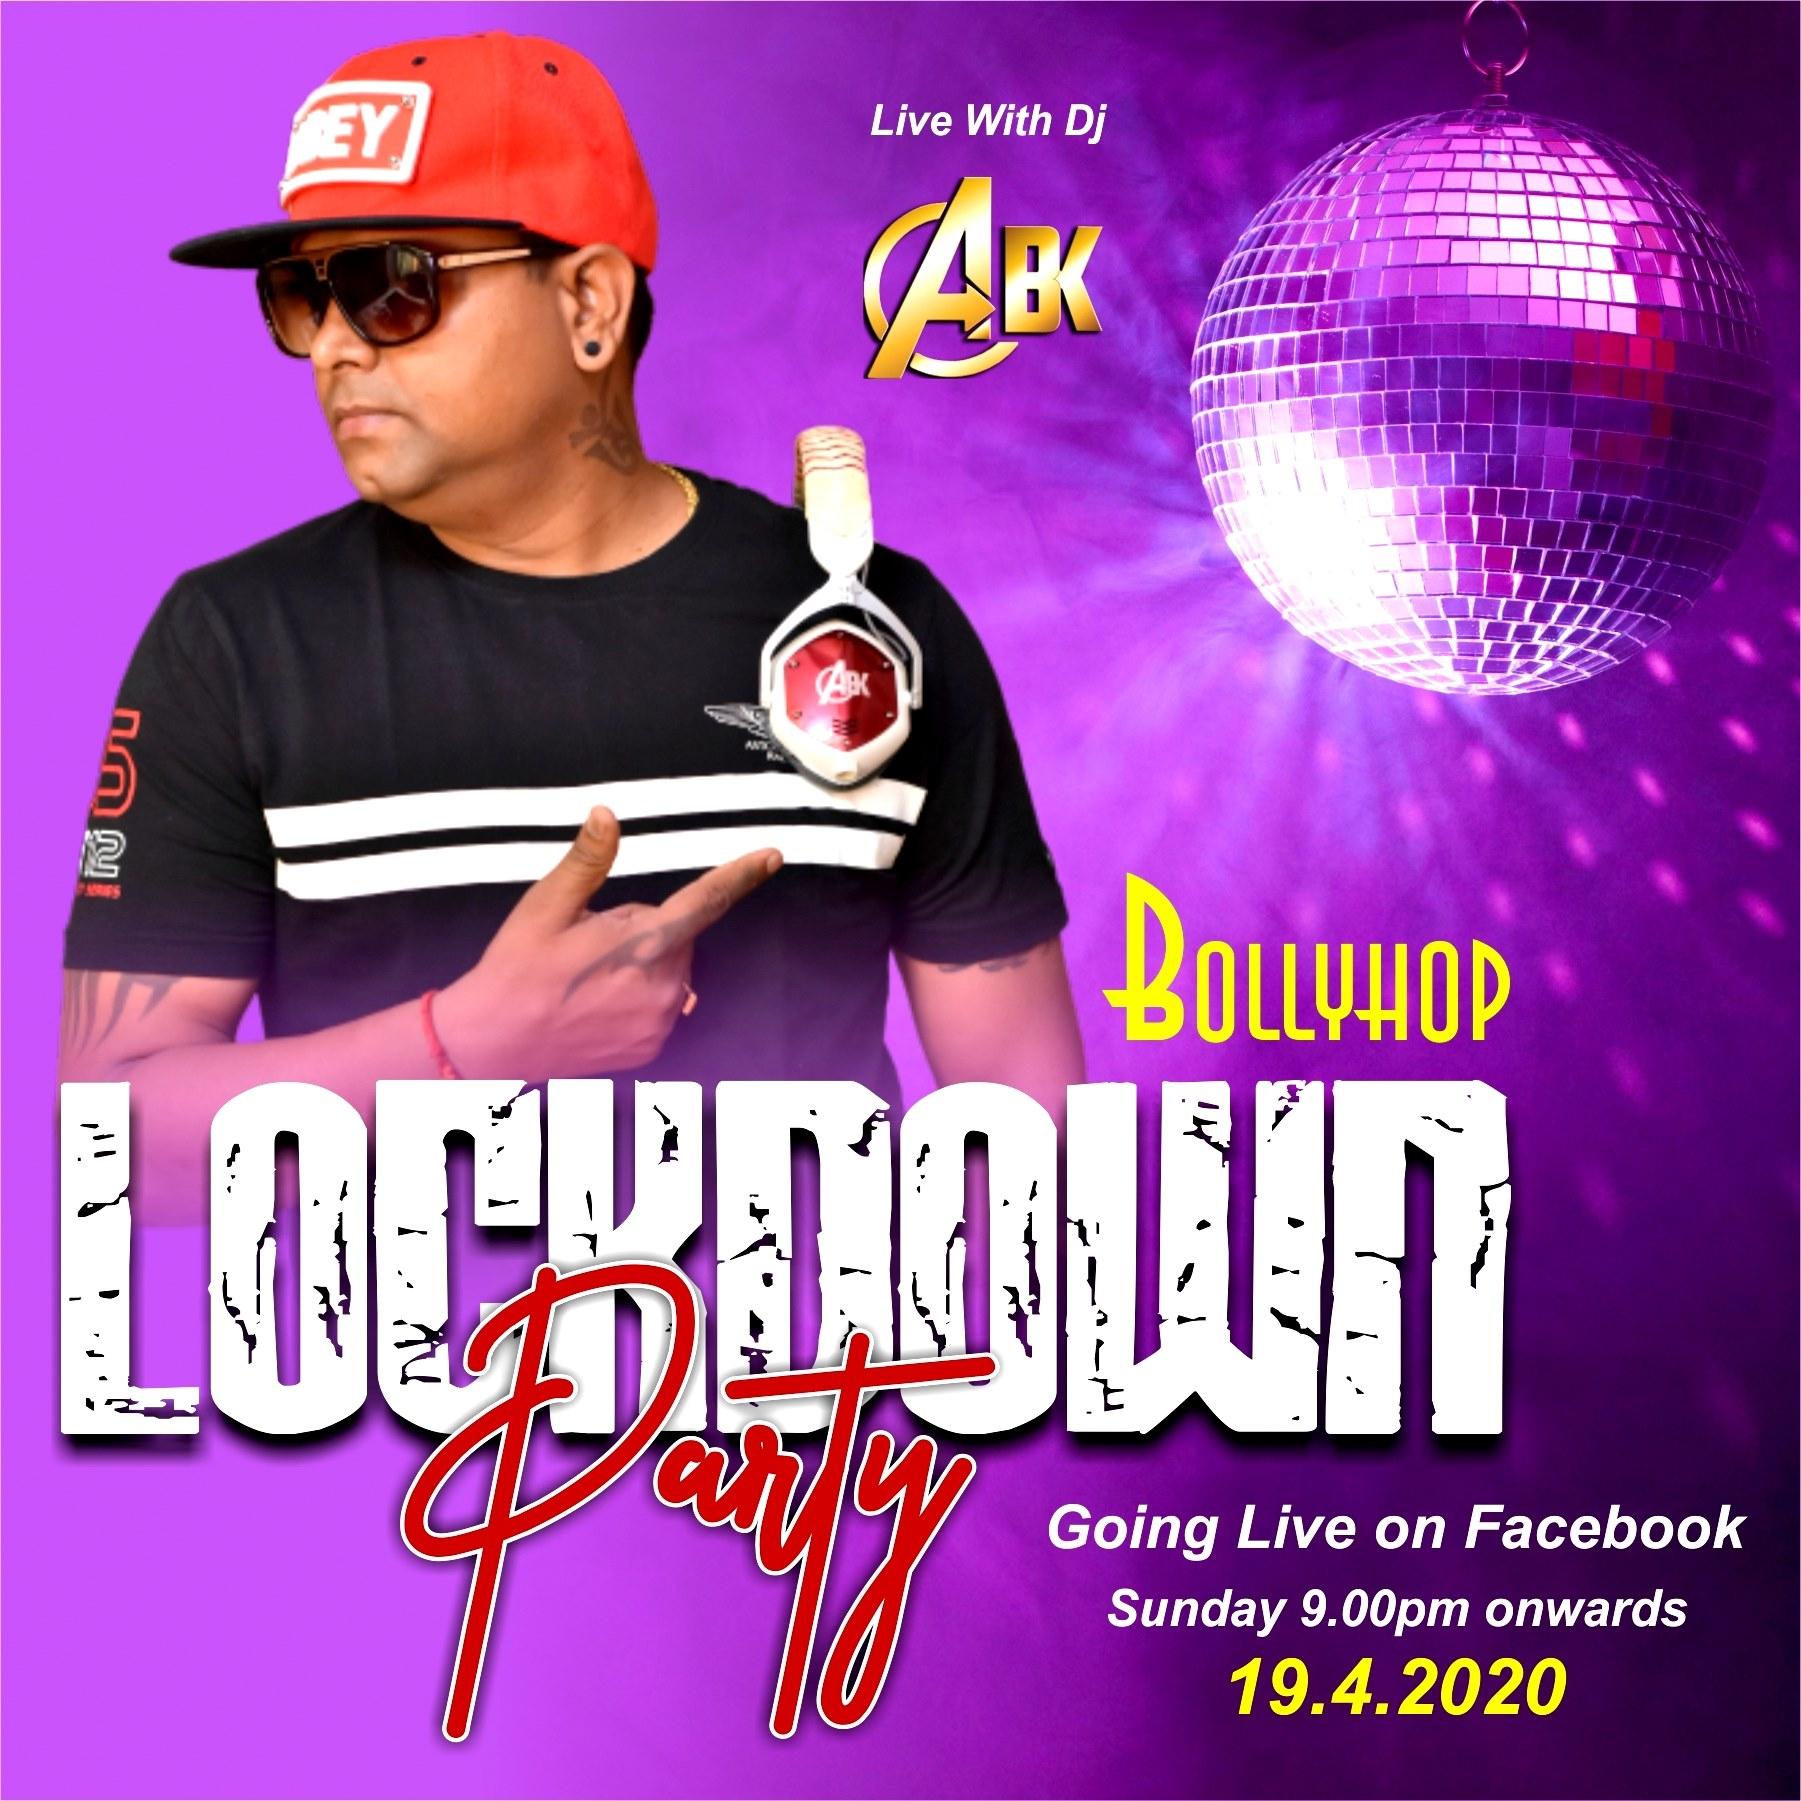 Bollywood Lockdown Party